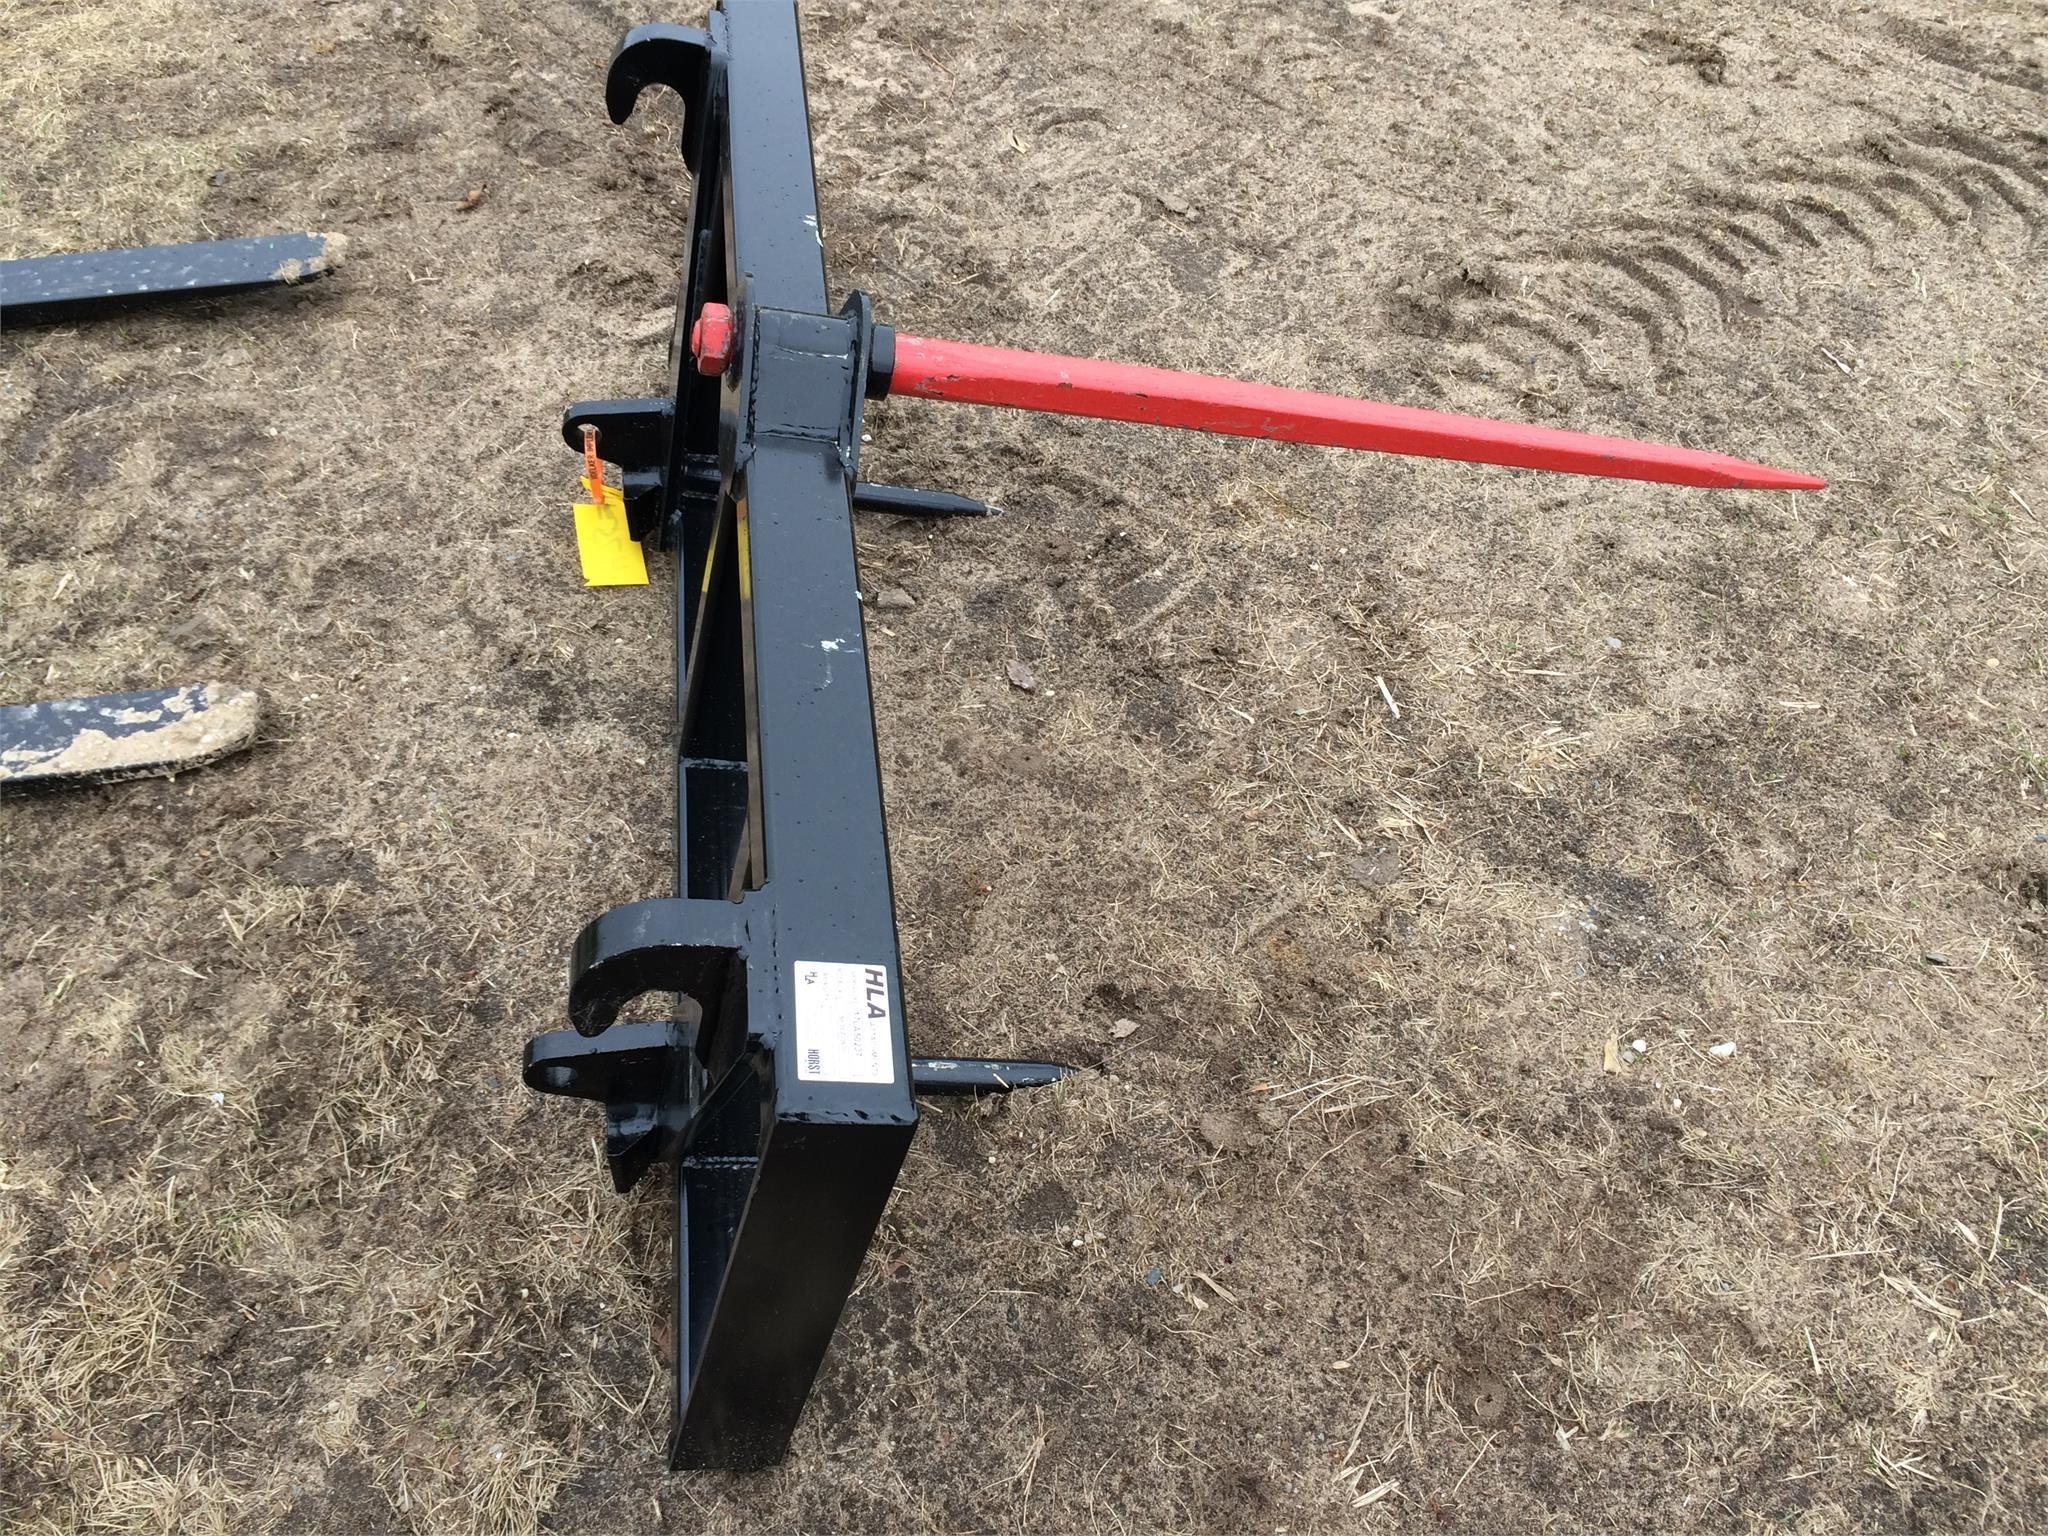 2017 HLA SE50AO600 Loader and Skid Steer Attachment